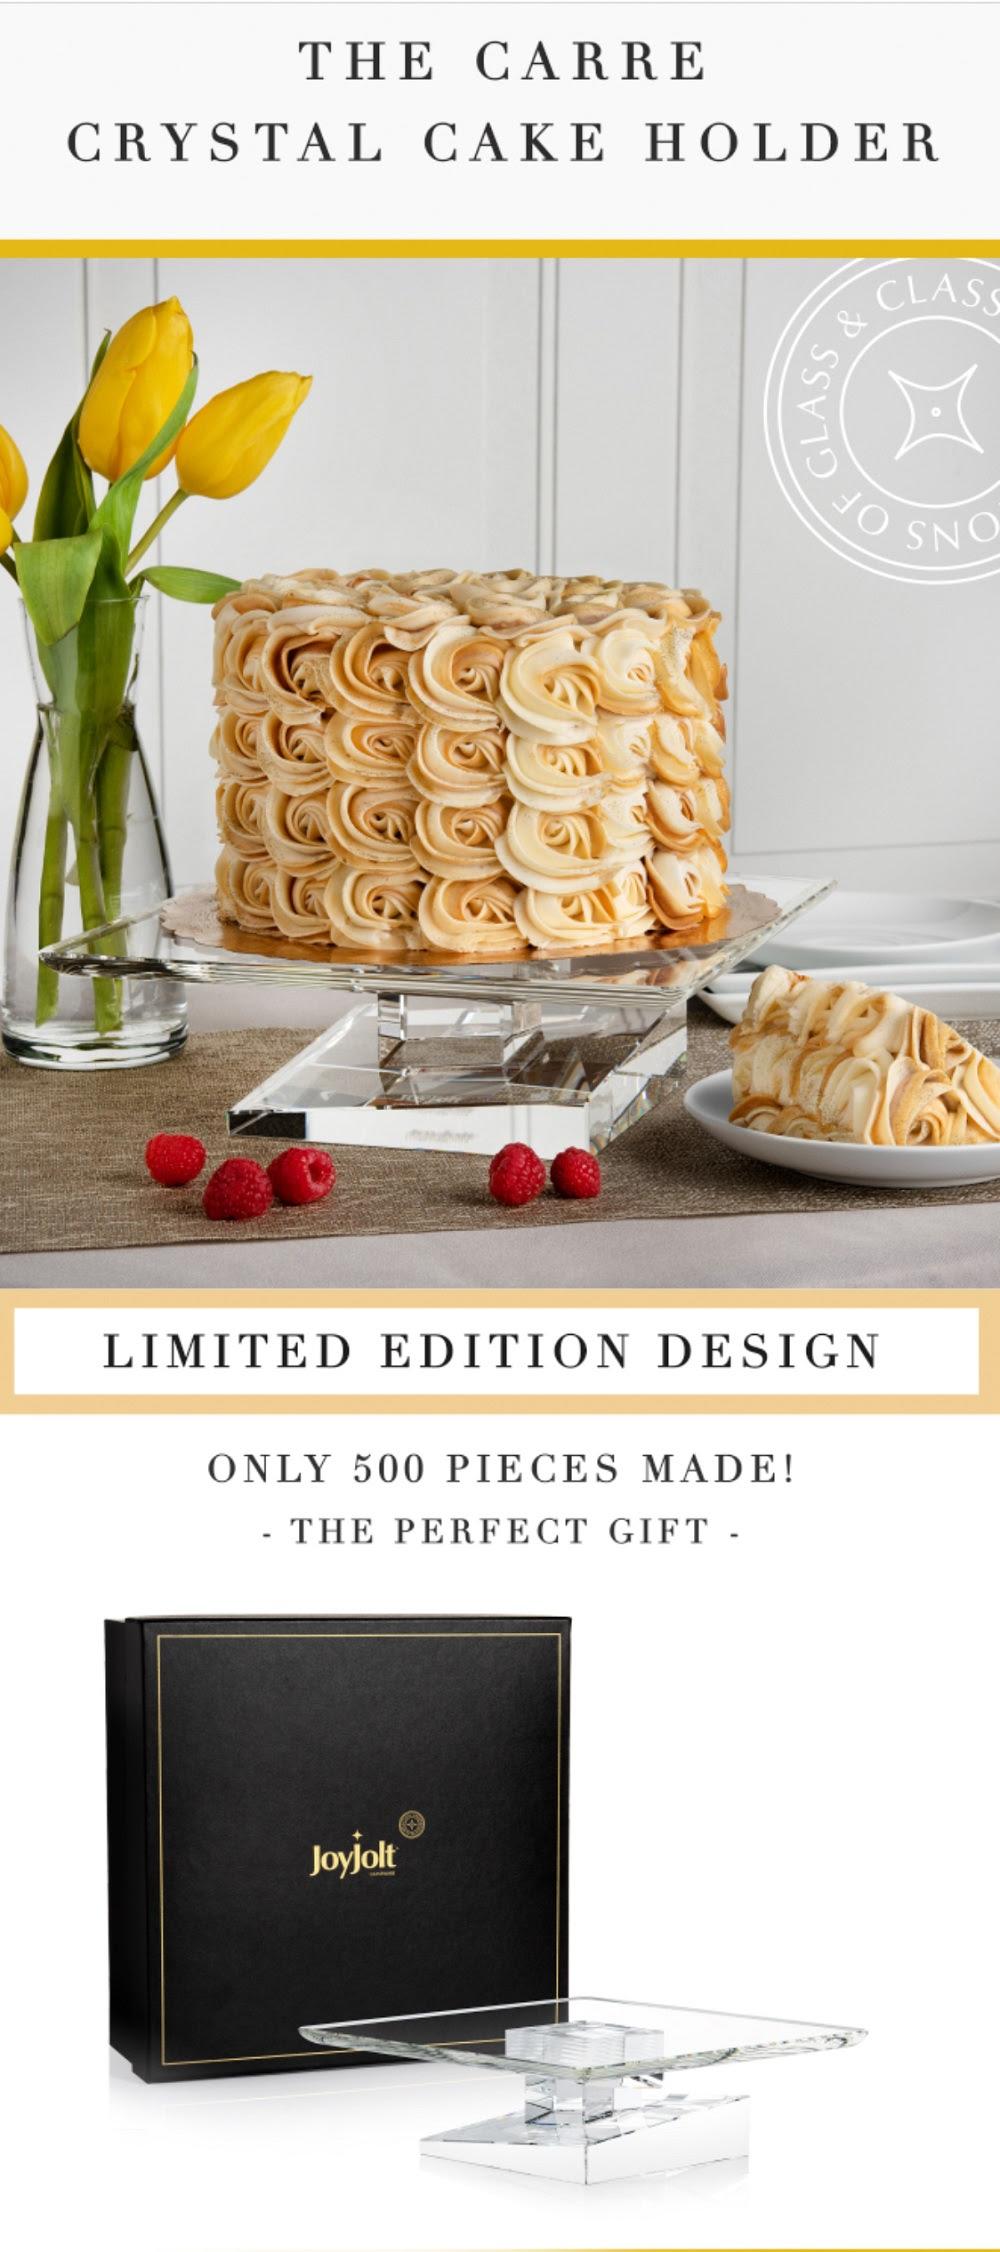 JoyJolt's Carre Crystal Glass Cake Holder 100% high qualitly crystal #LimitedEdition #JoyJolt #Cake